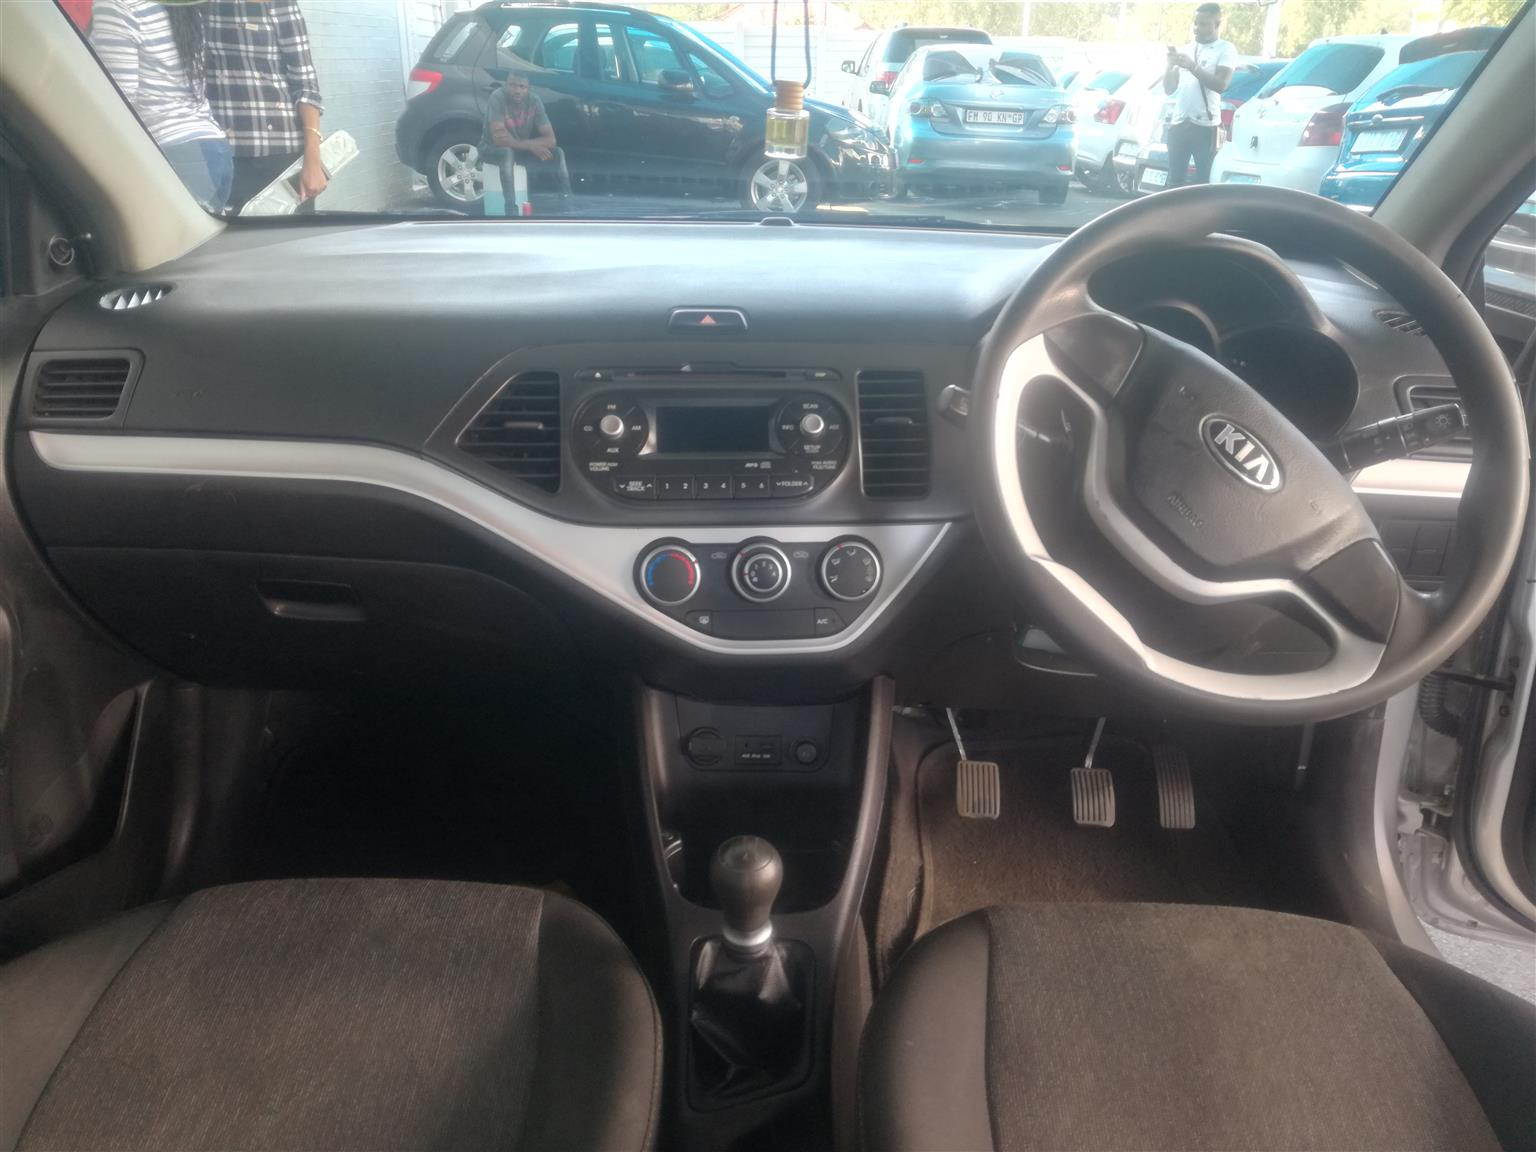 2015 Kia Picanto 1.2 Smart